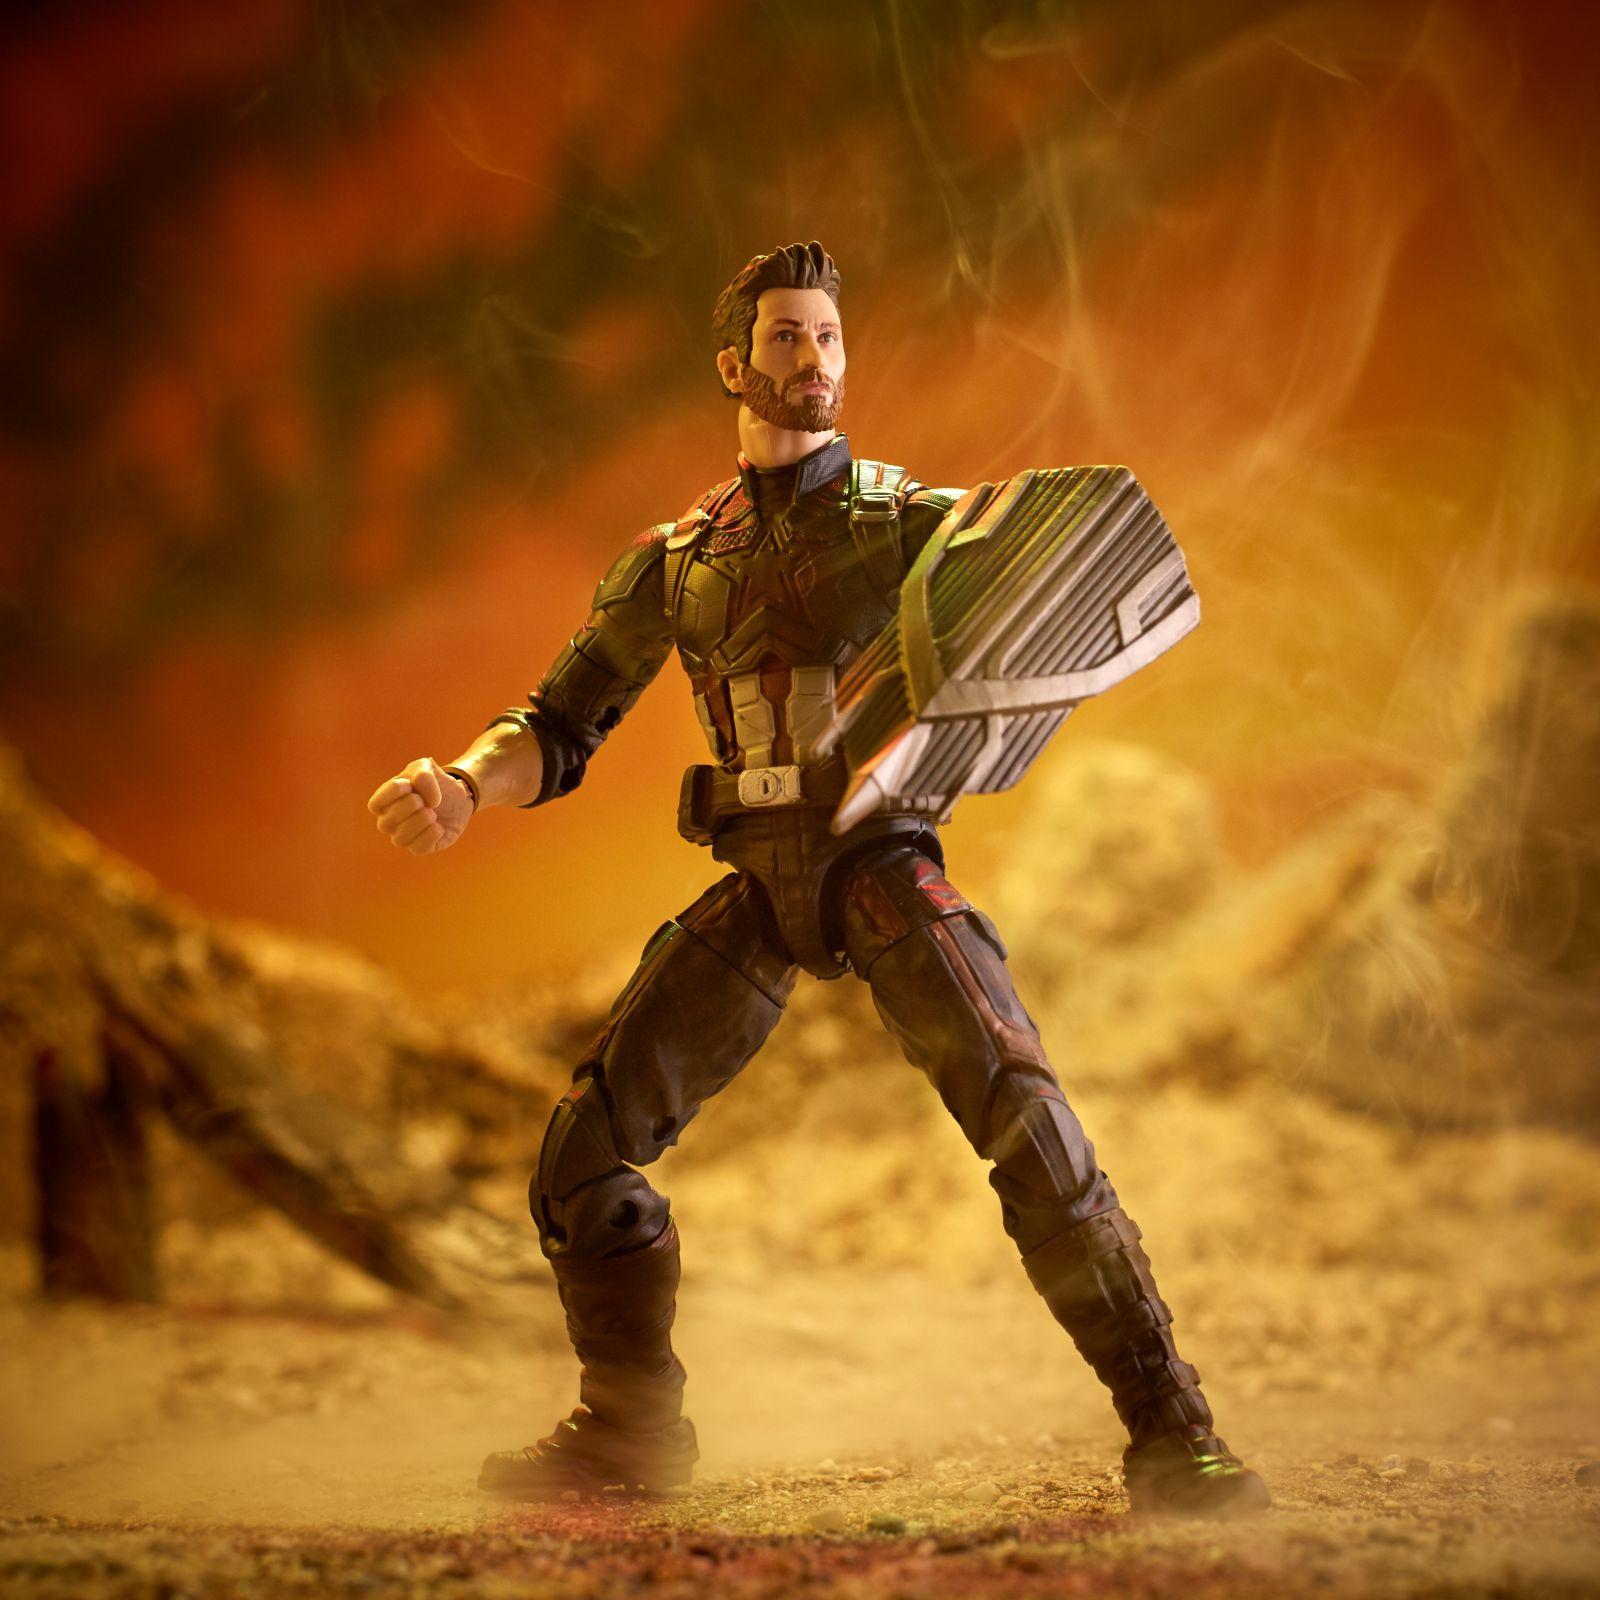 Hasbro S Avengers Infinity War Action Figures Revealed